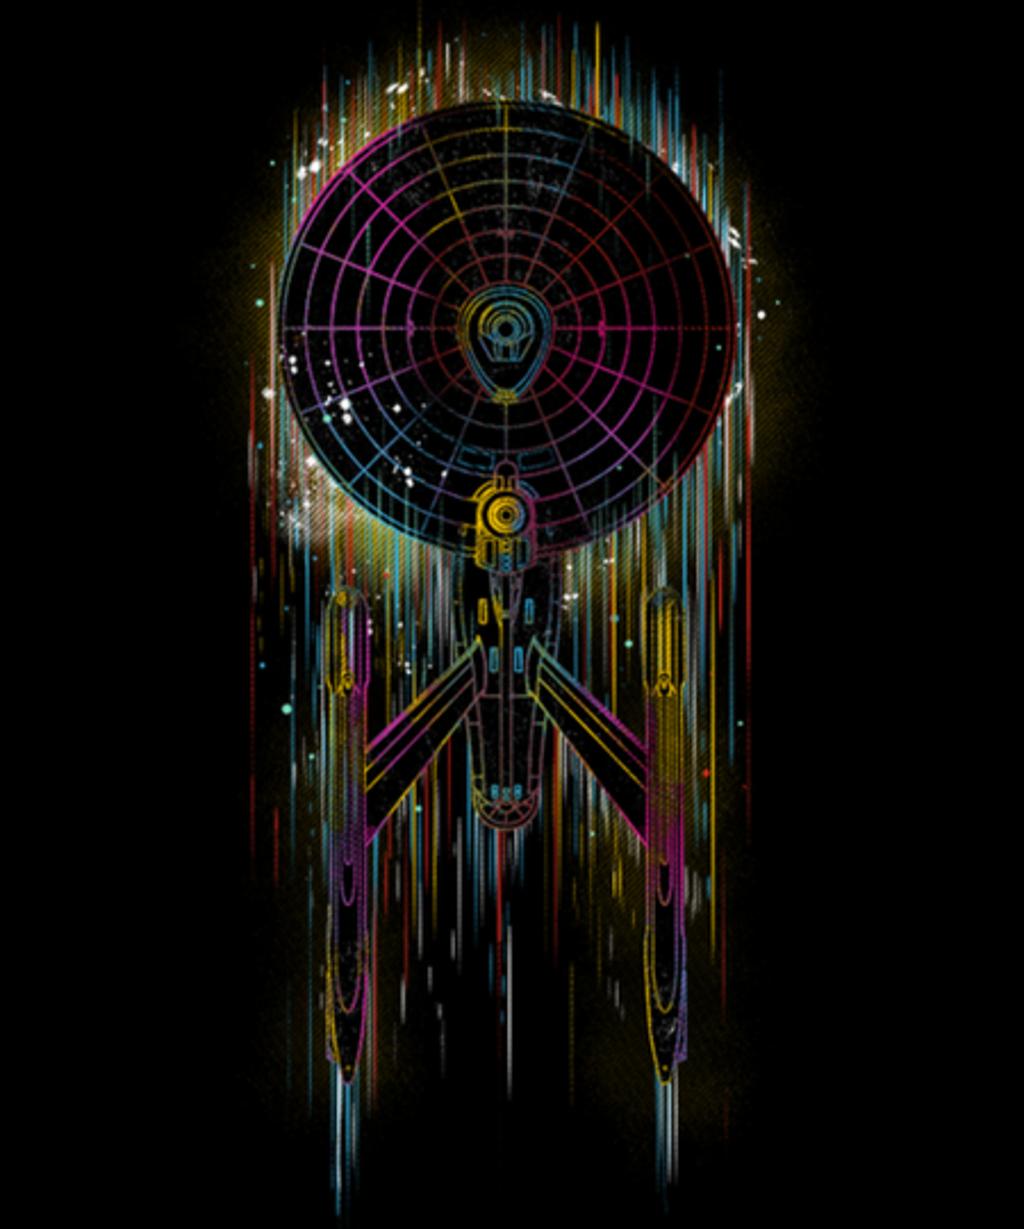 Qwertee: neon boldly